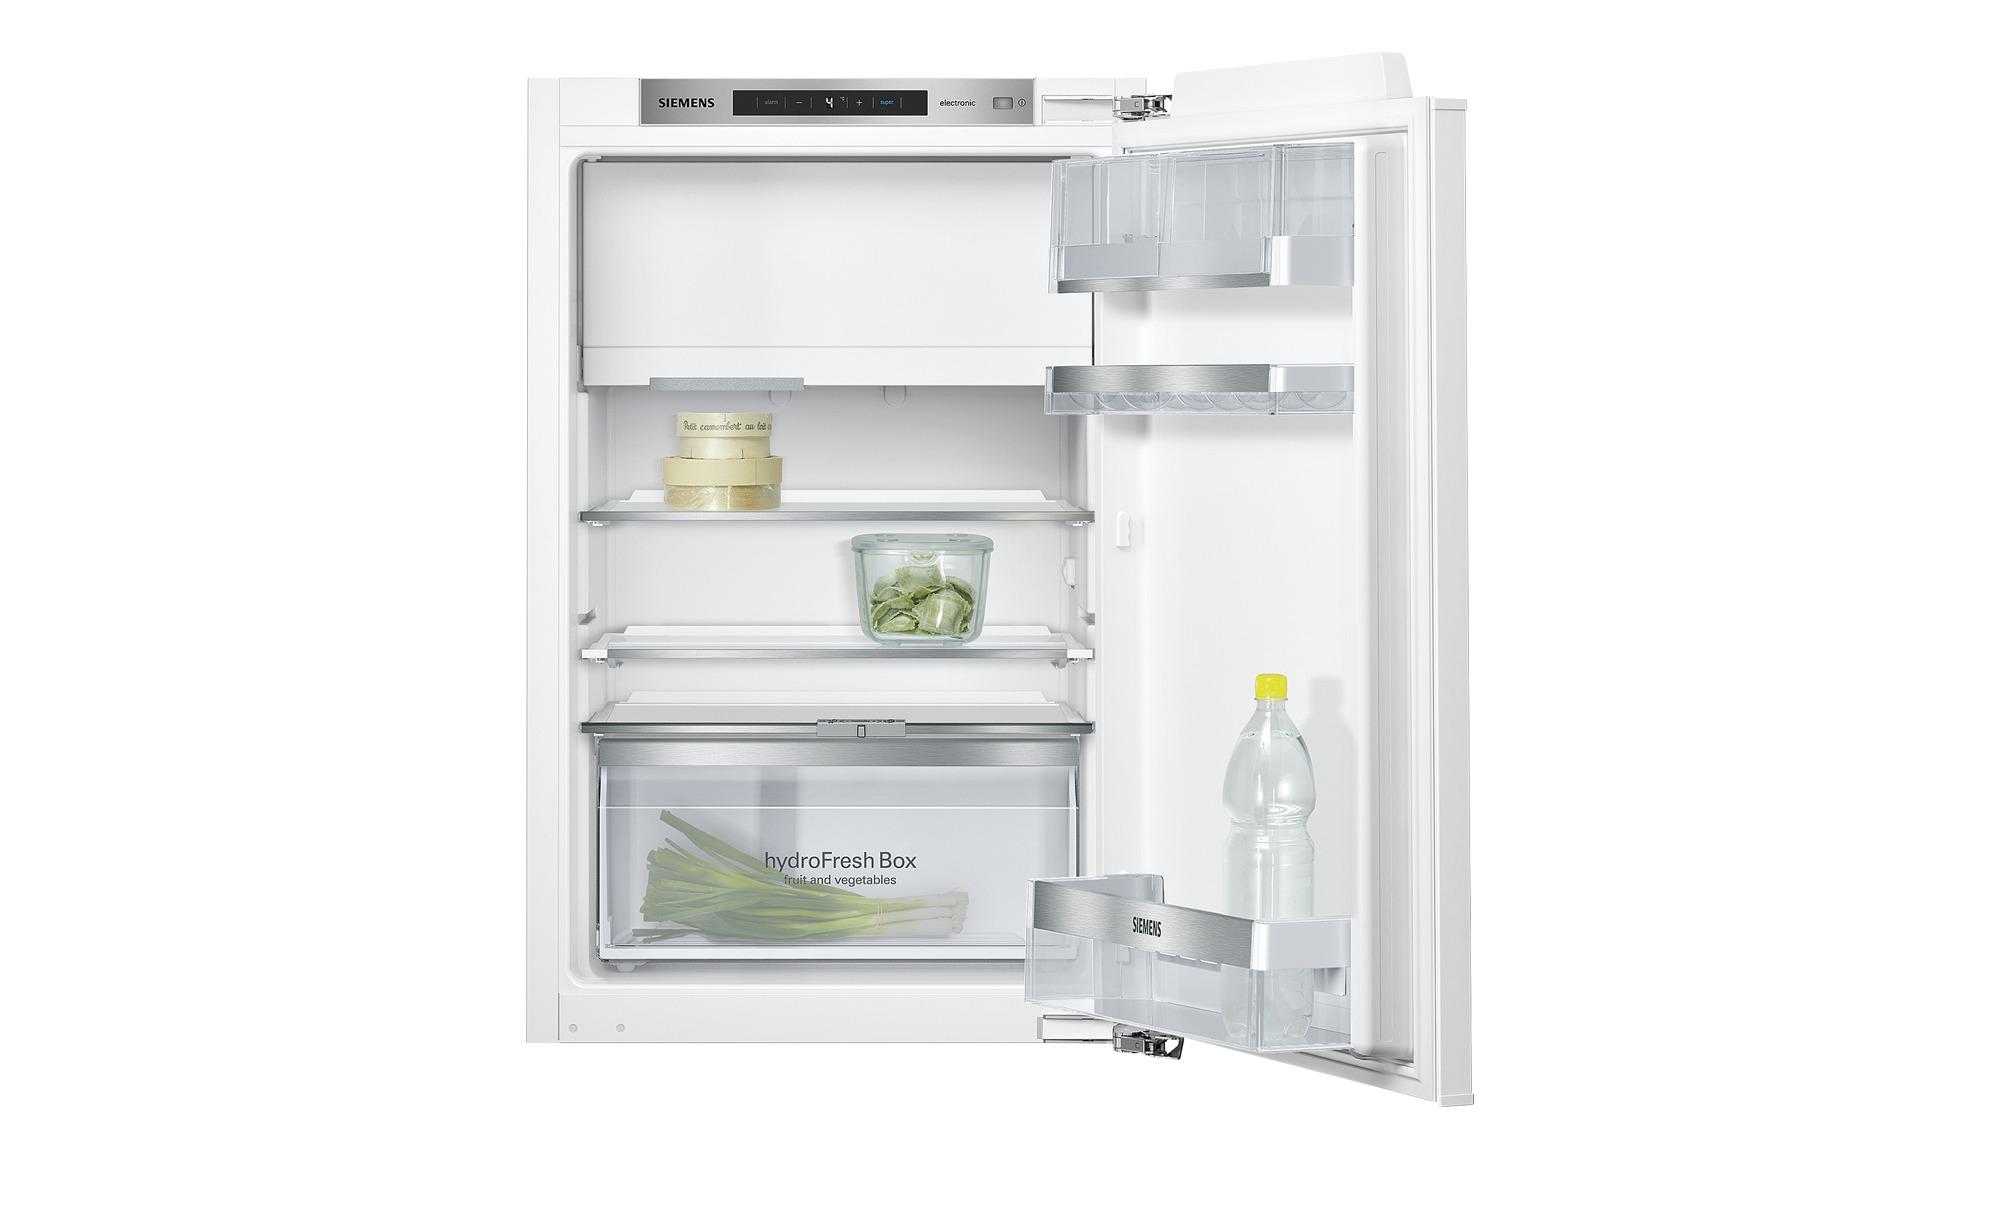 Siemens Kühlschrank A : Siemens einbau kühlschrank ki lad möbel höffner